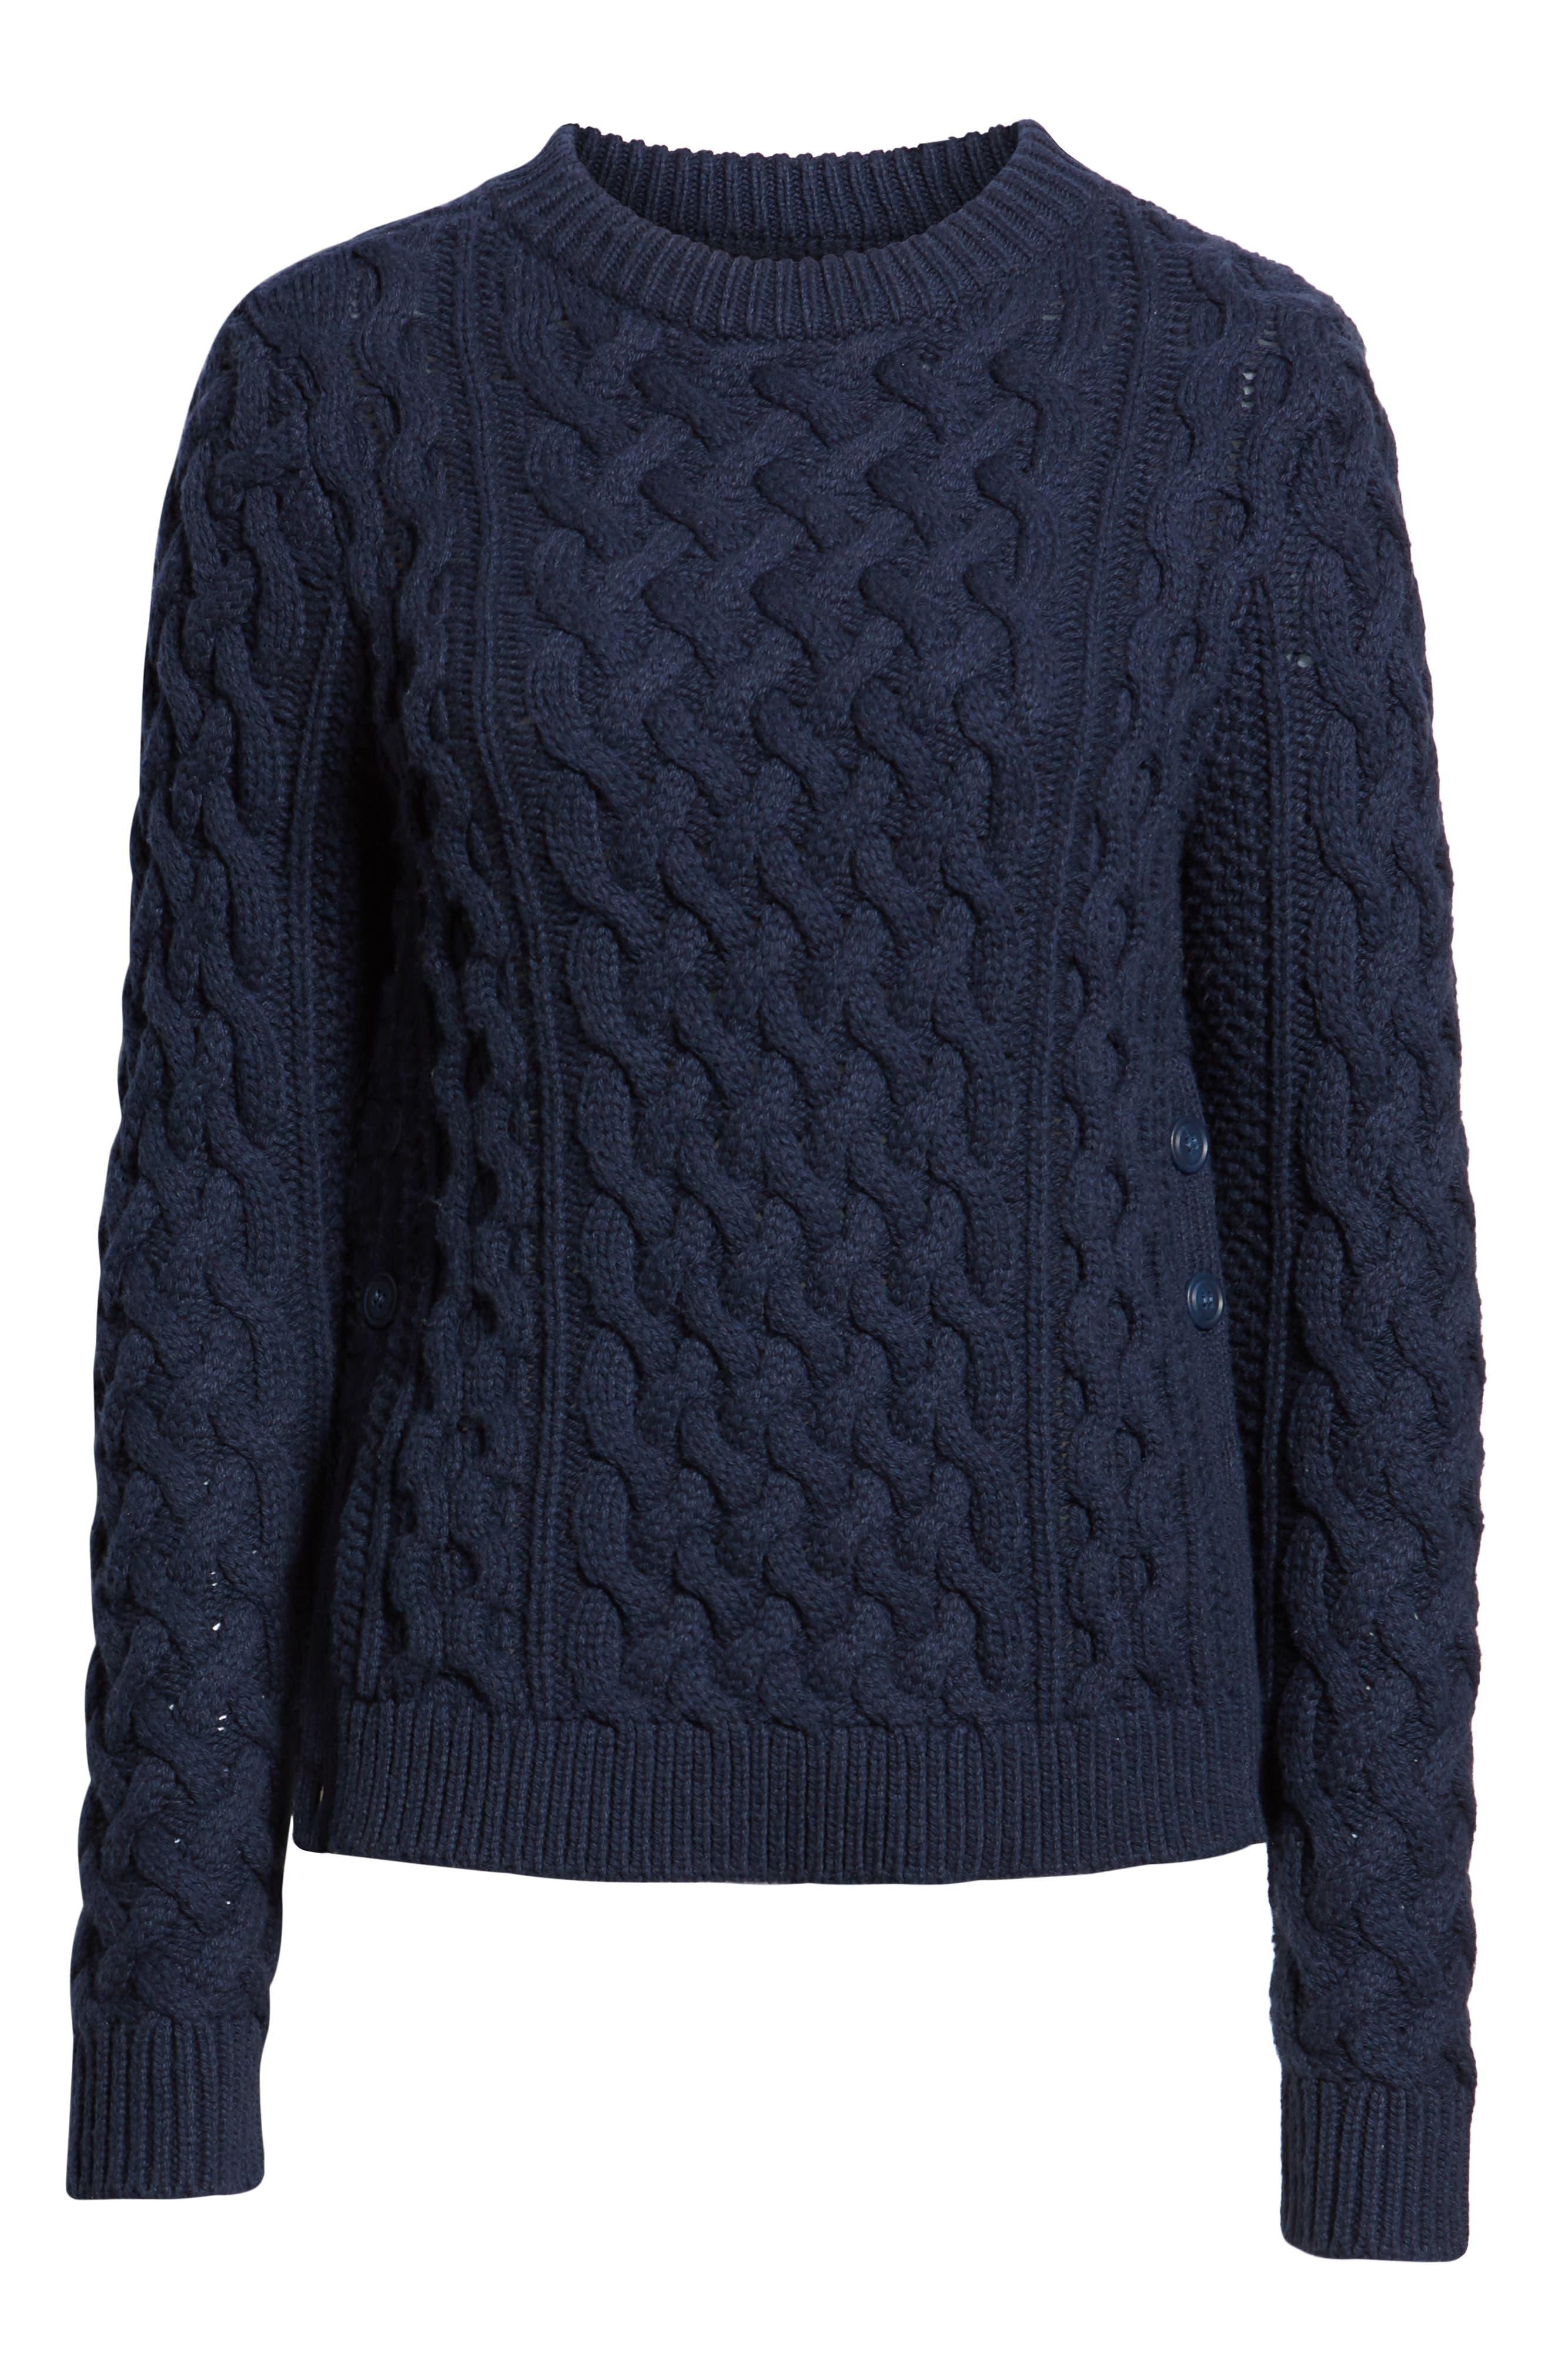 Fisherwoman Crewneck Pullover Sweater,                             Alternate thumbnail 6, color,                             NAVY BLAZER